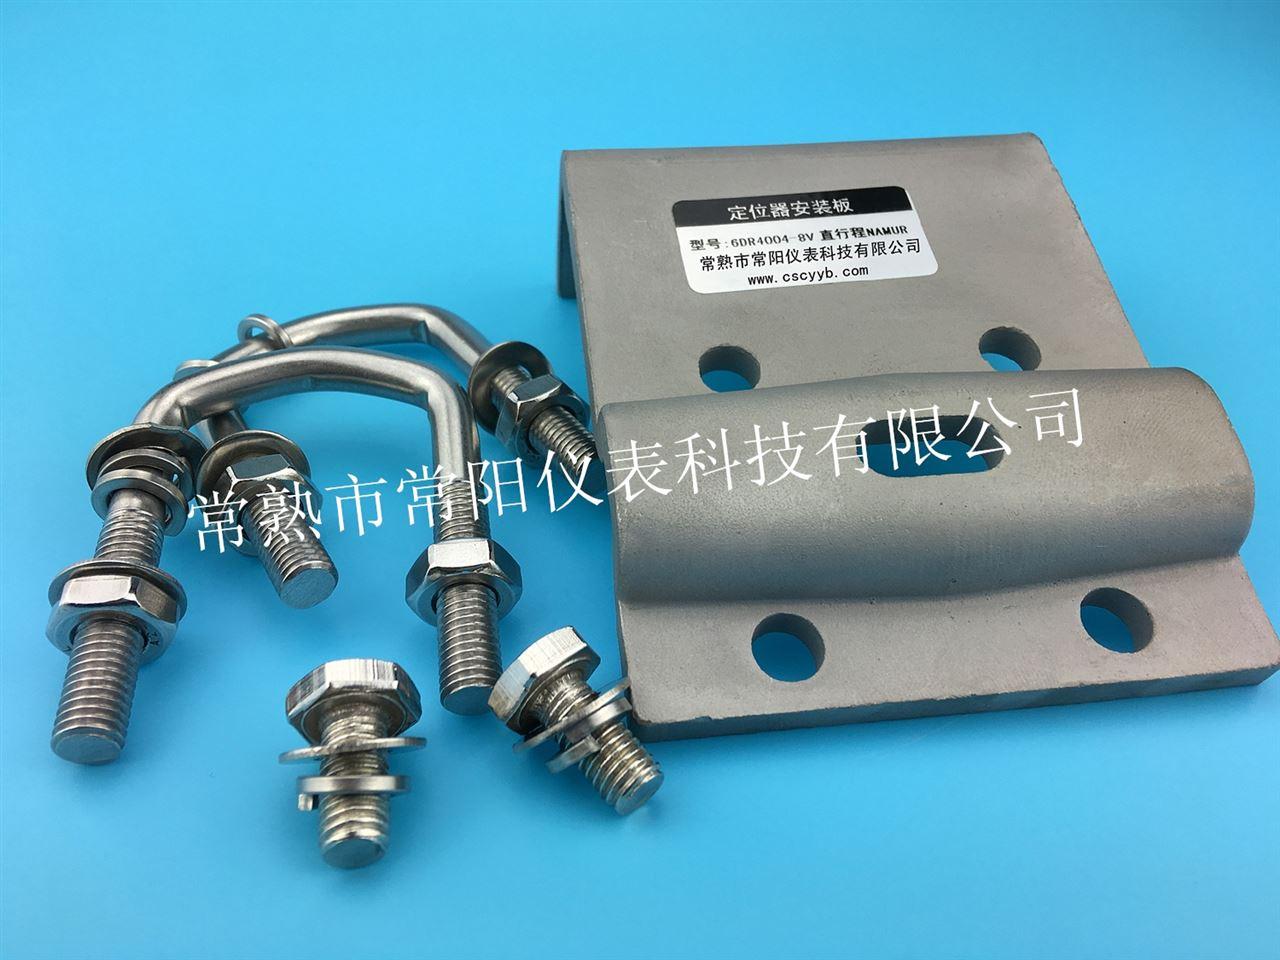 6DR4004-8V直行程安裝組件